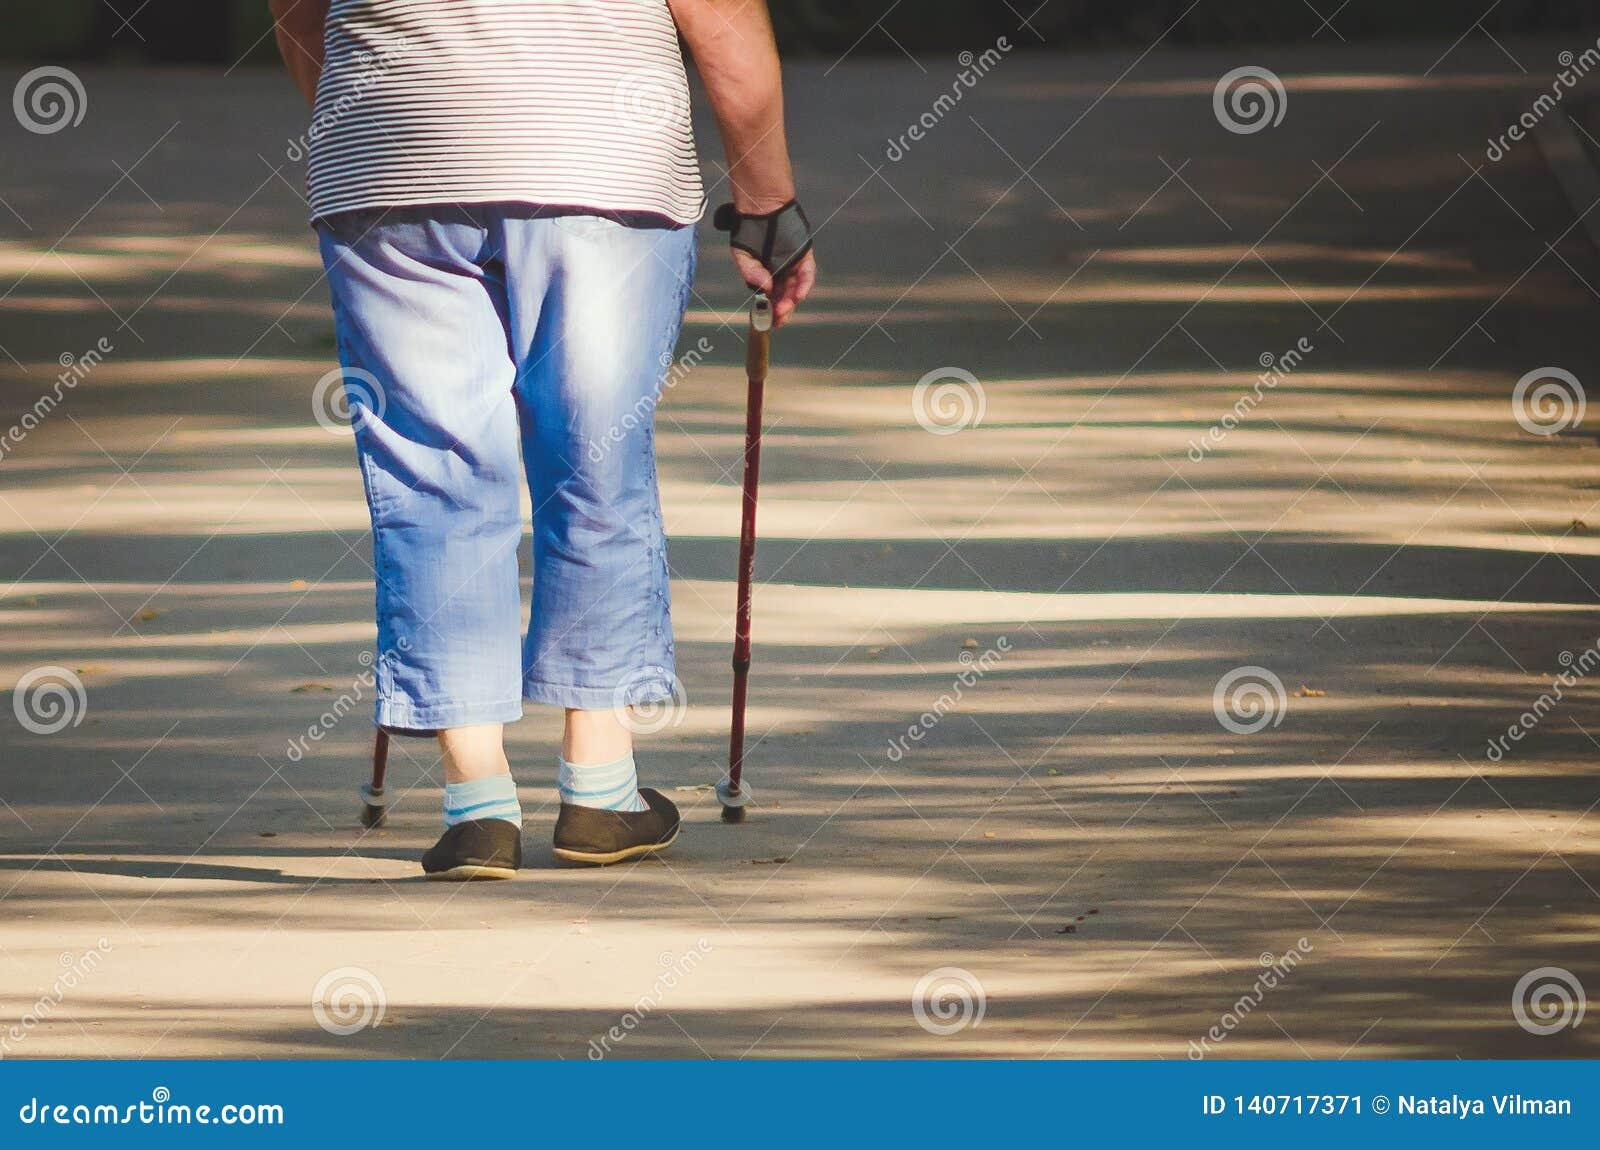 An elderly woman is engaged in Scandinavian walk in the park, Russia